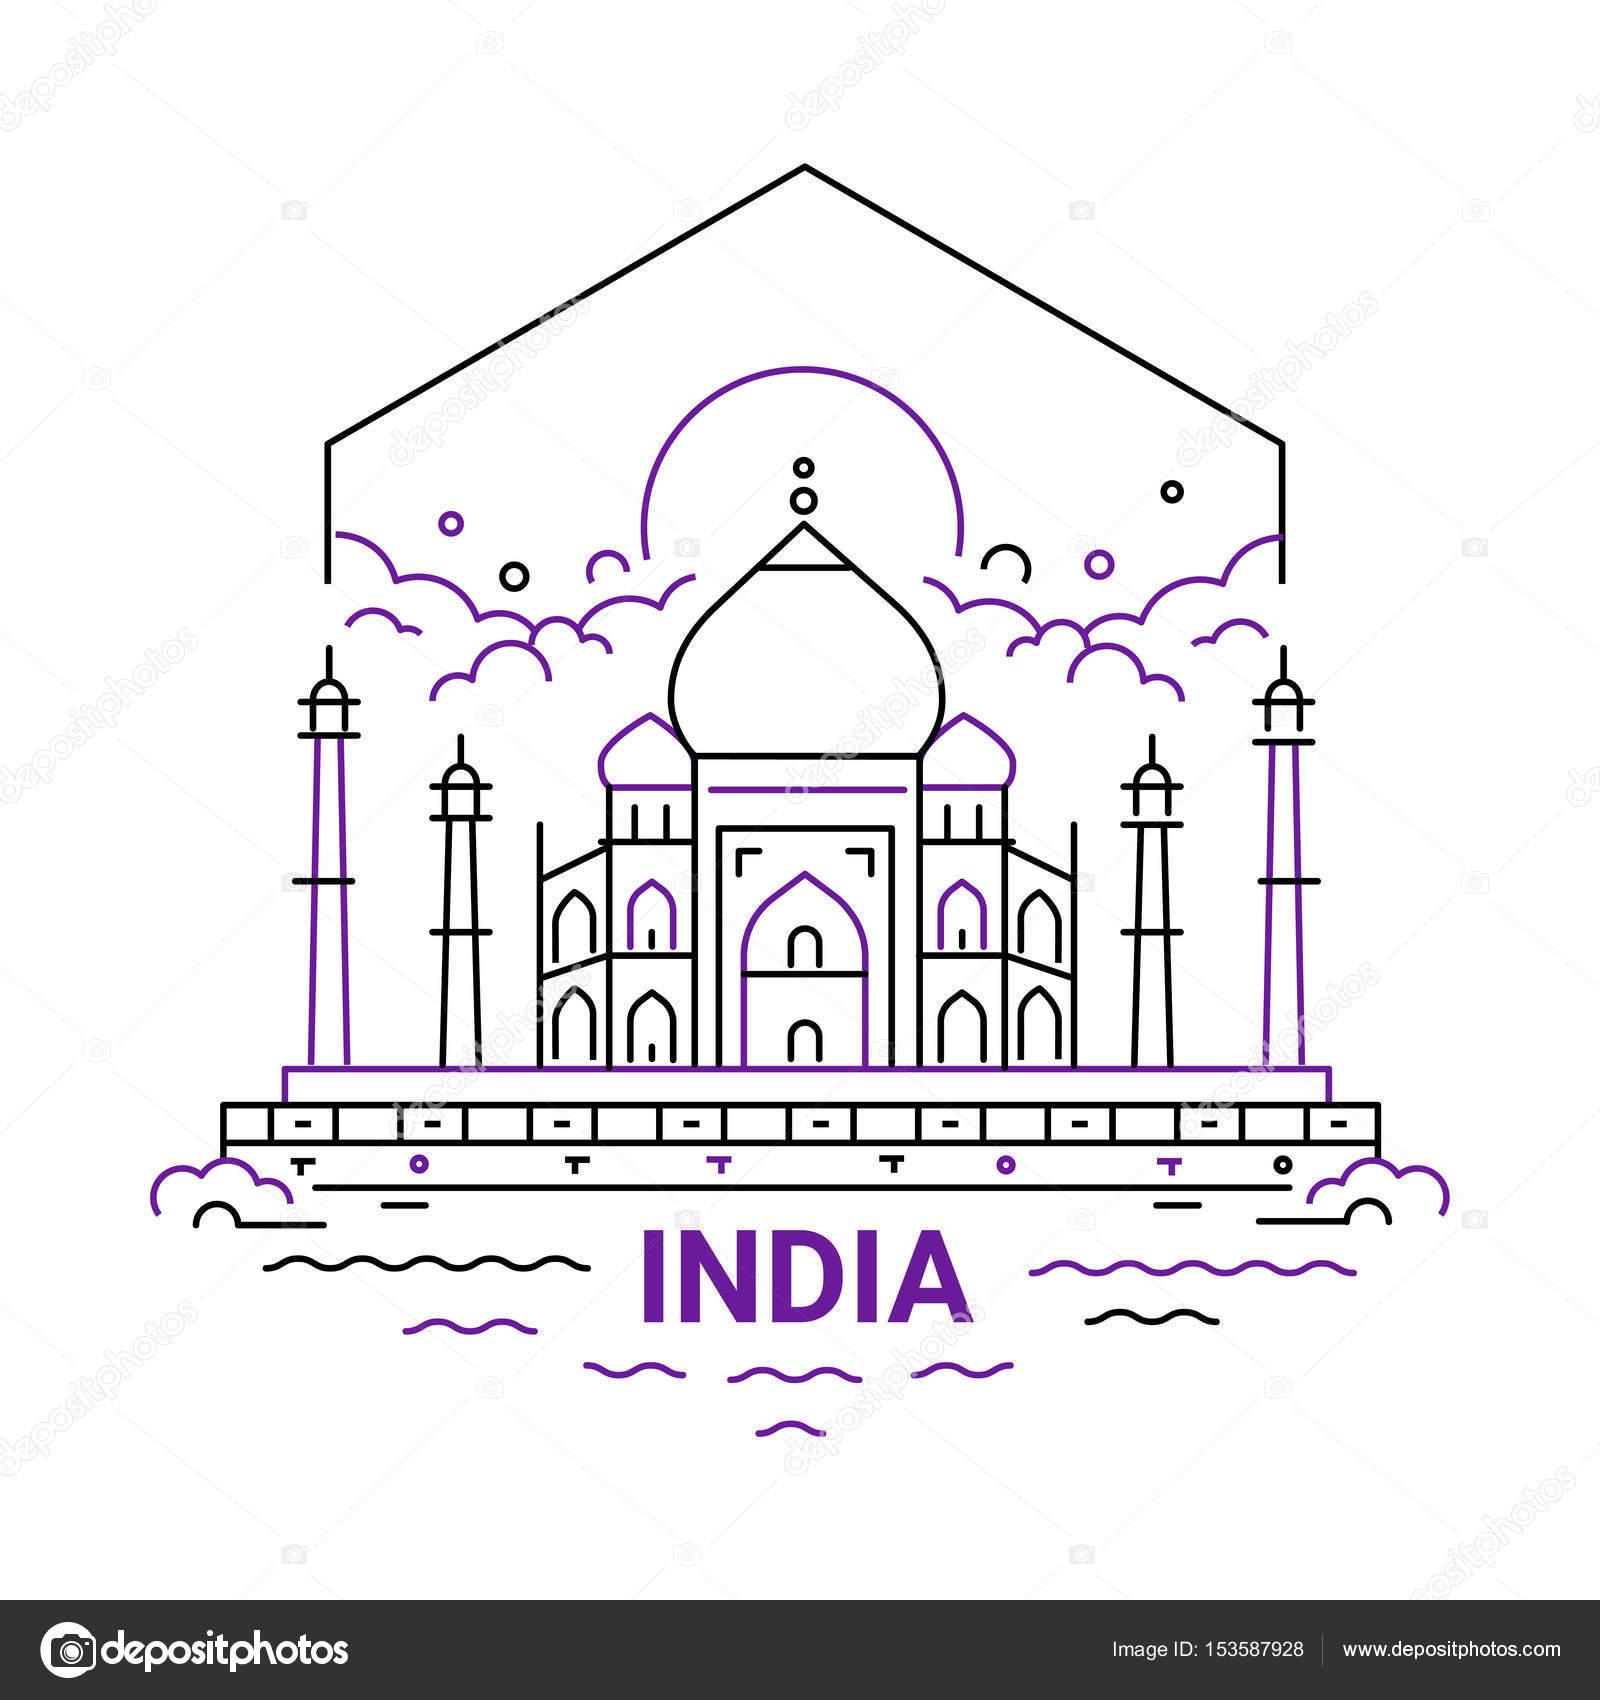 India - ilustración de vector moderno línea viaje — Vector de stock ...